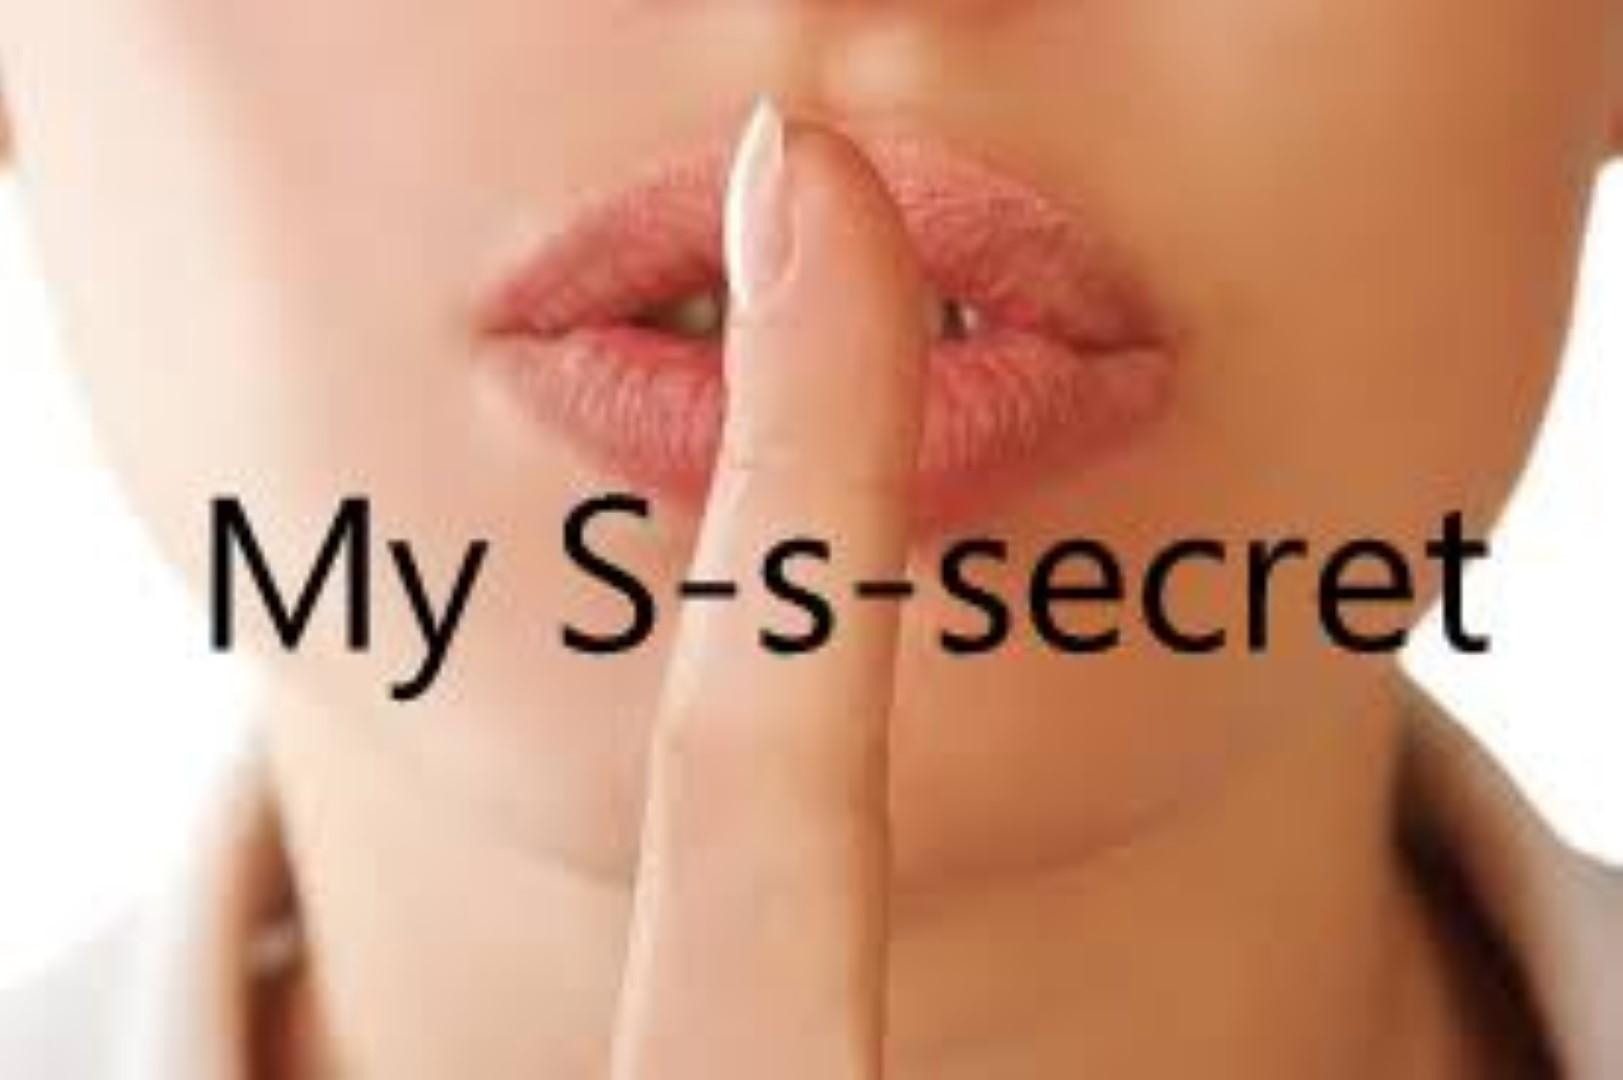 My S-s-secret